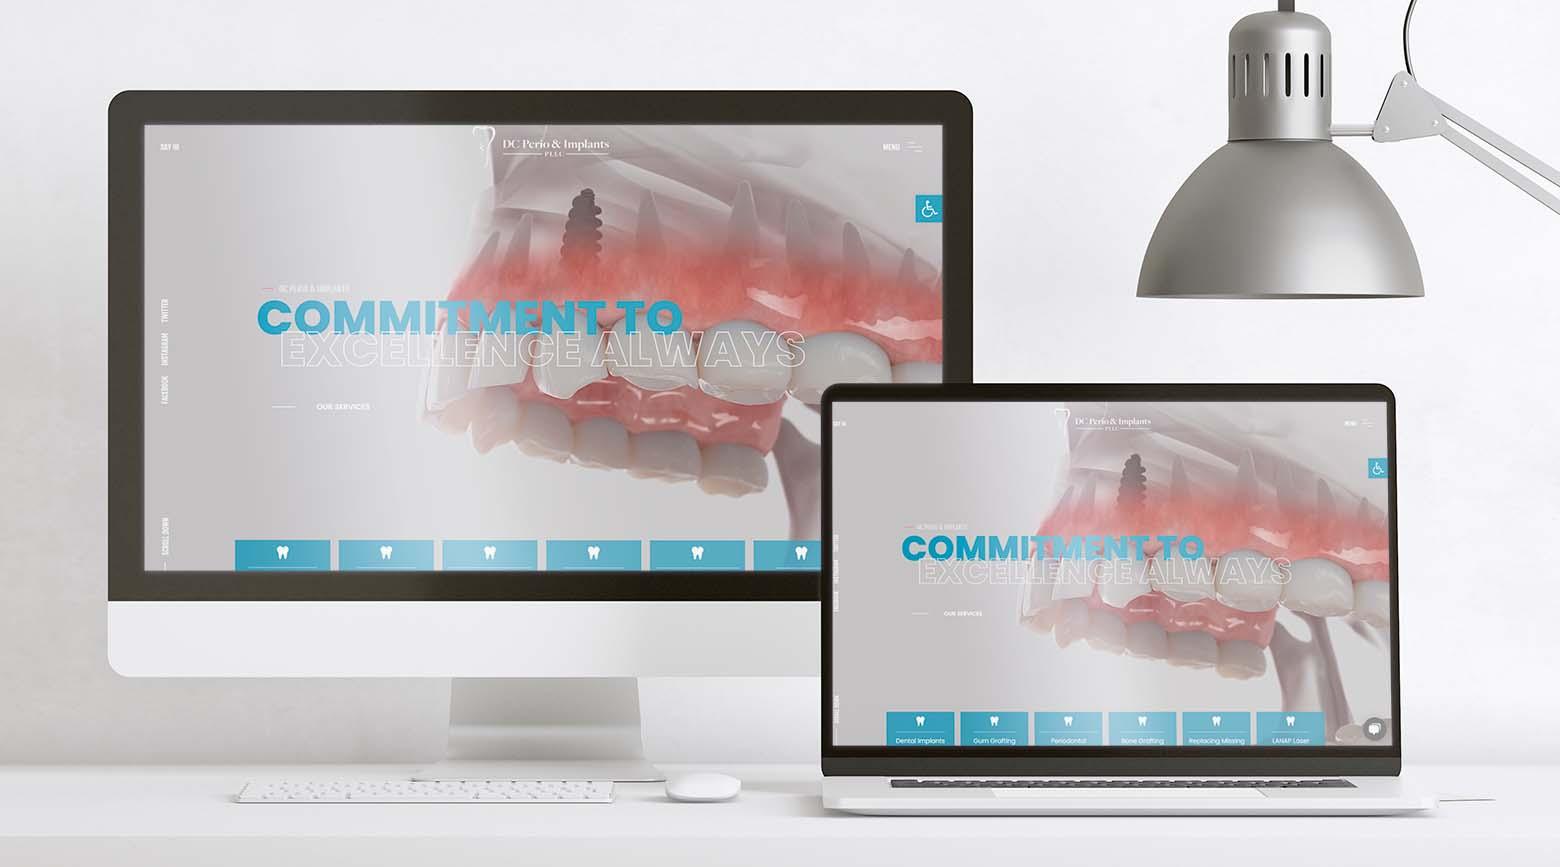 dc-perio-and-implants-portfolio-1.1.jpg